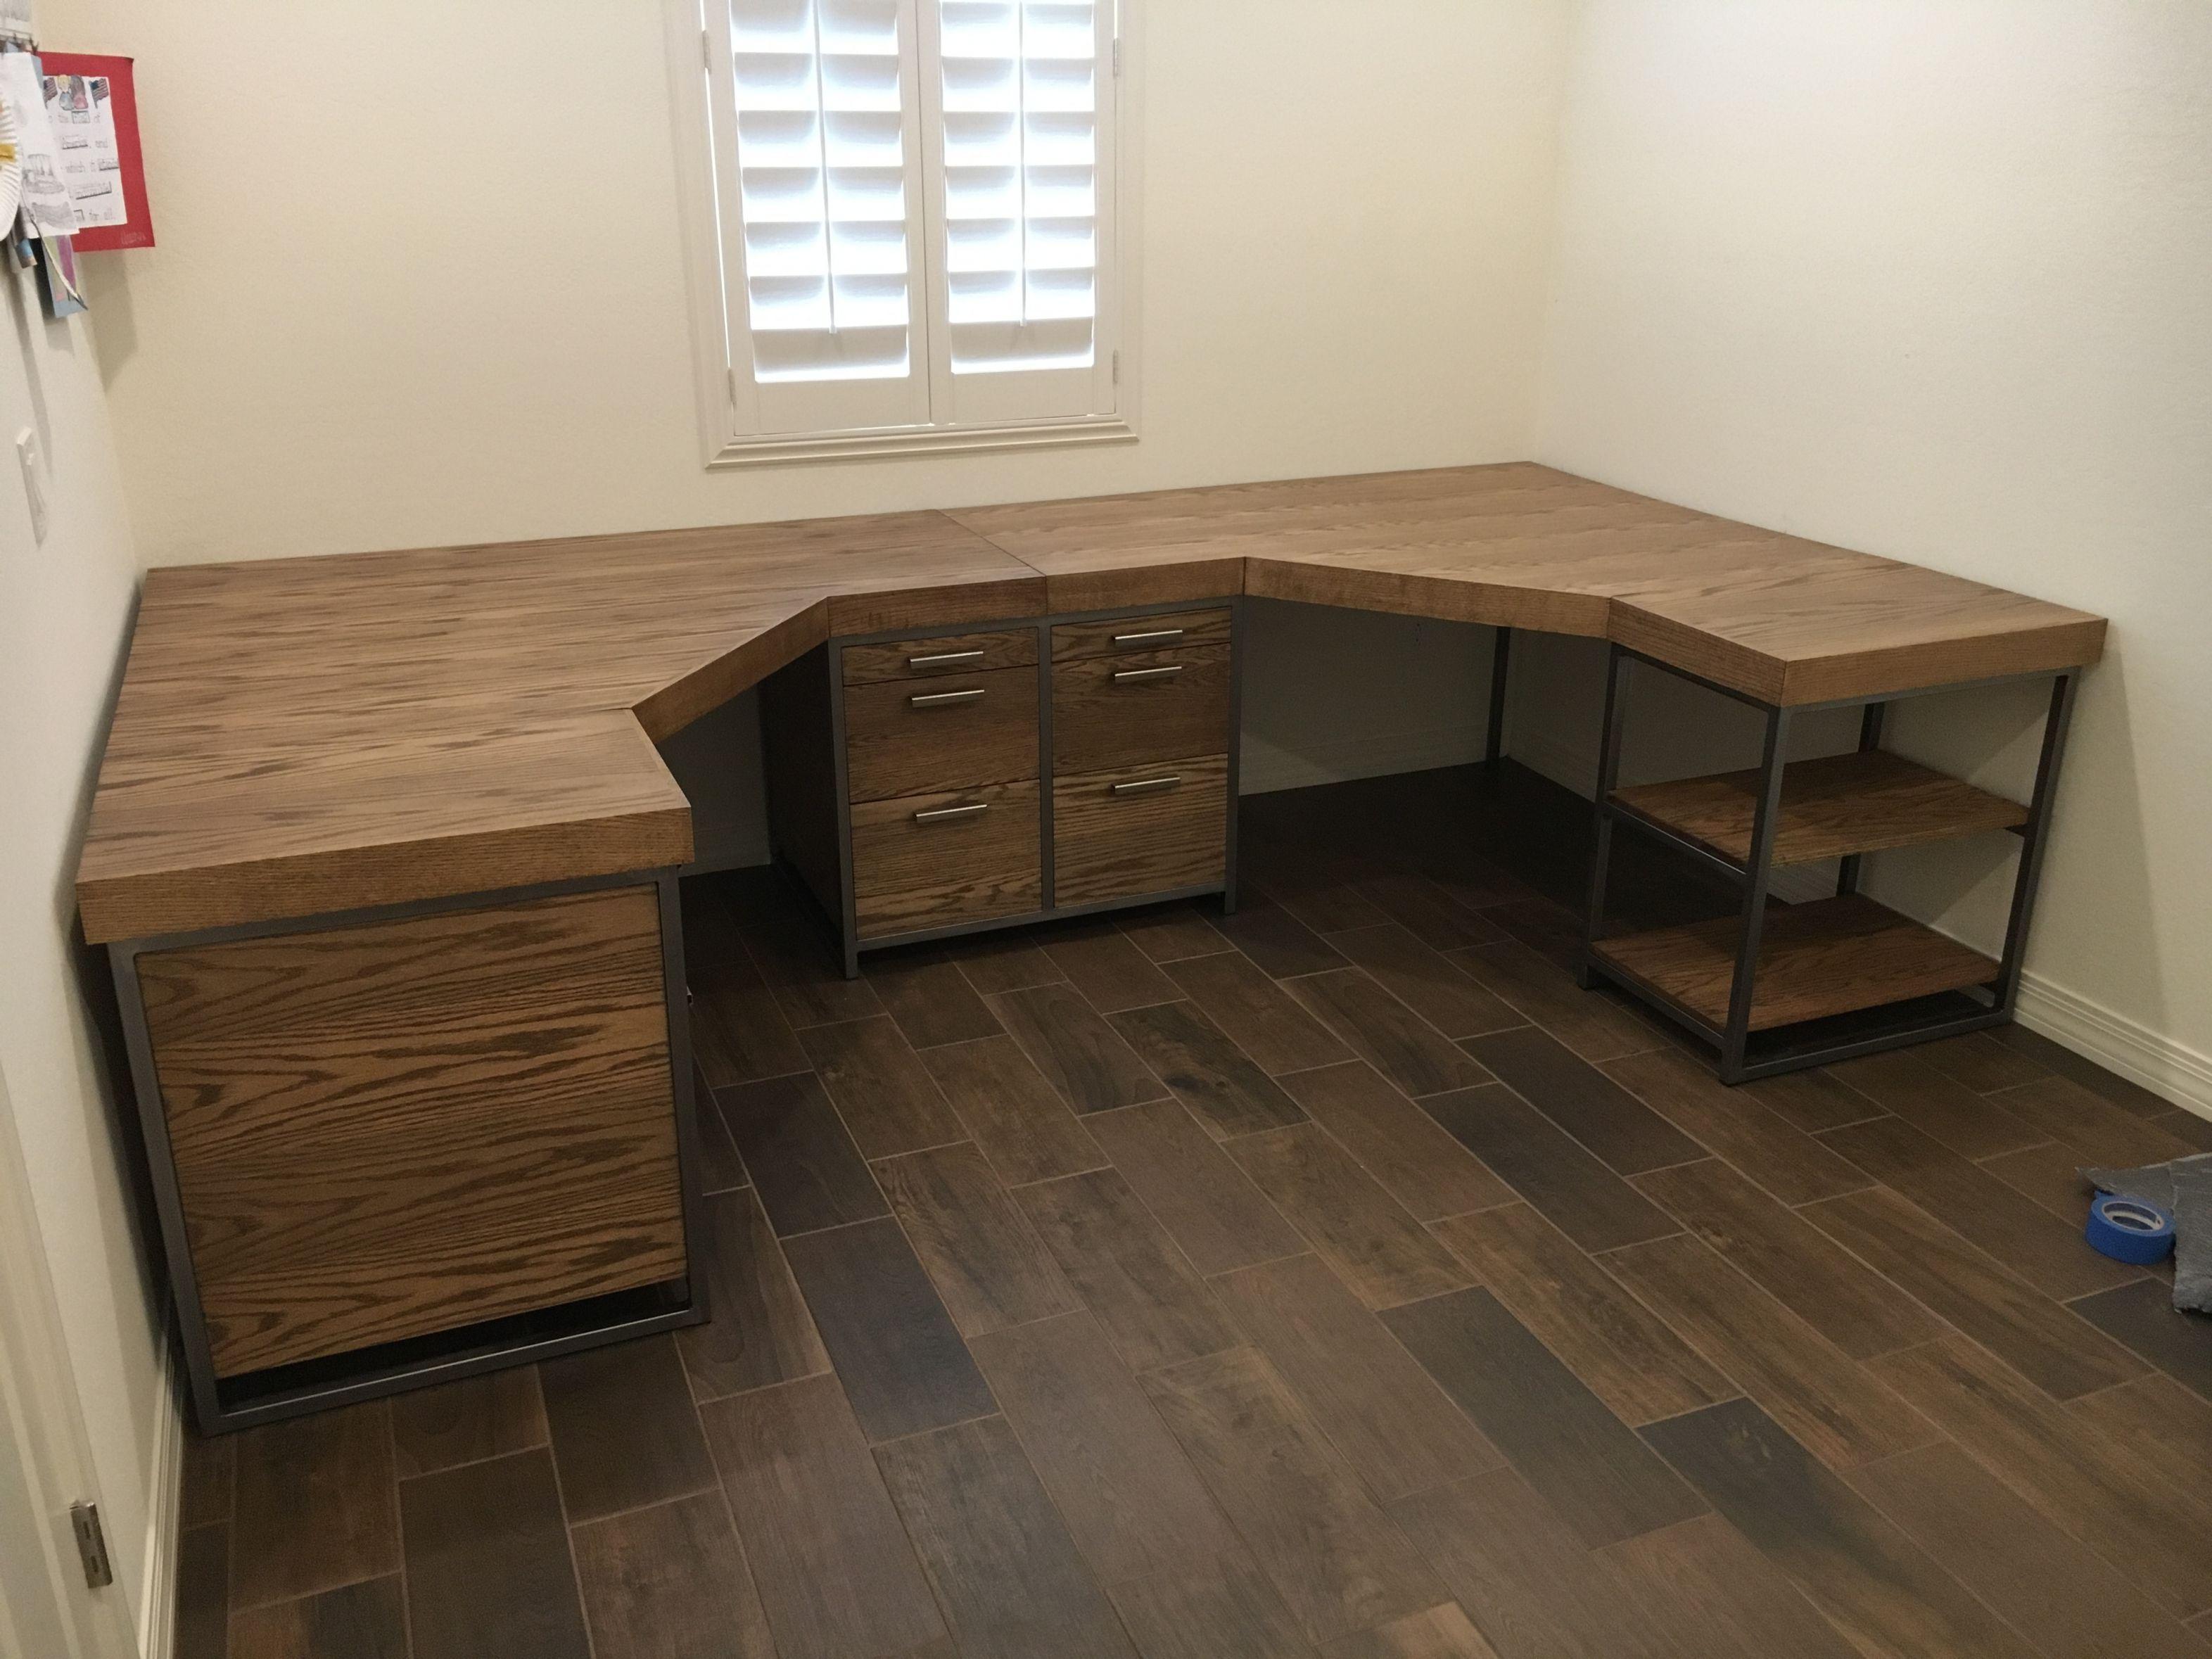 Diy Industrial Desk Plans